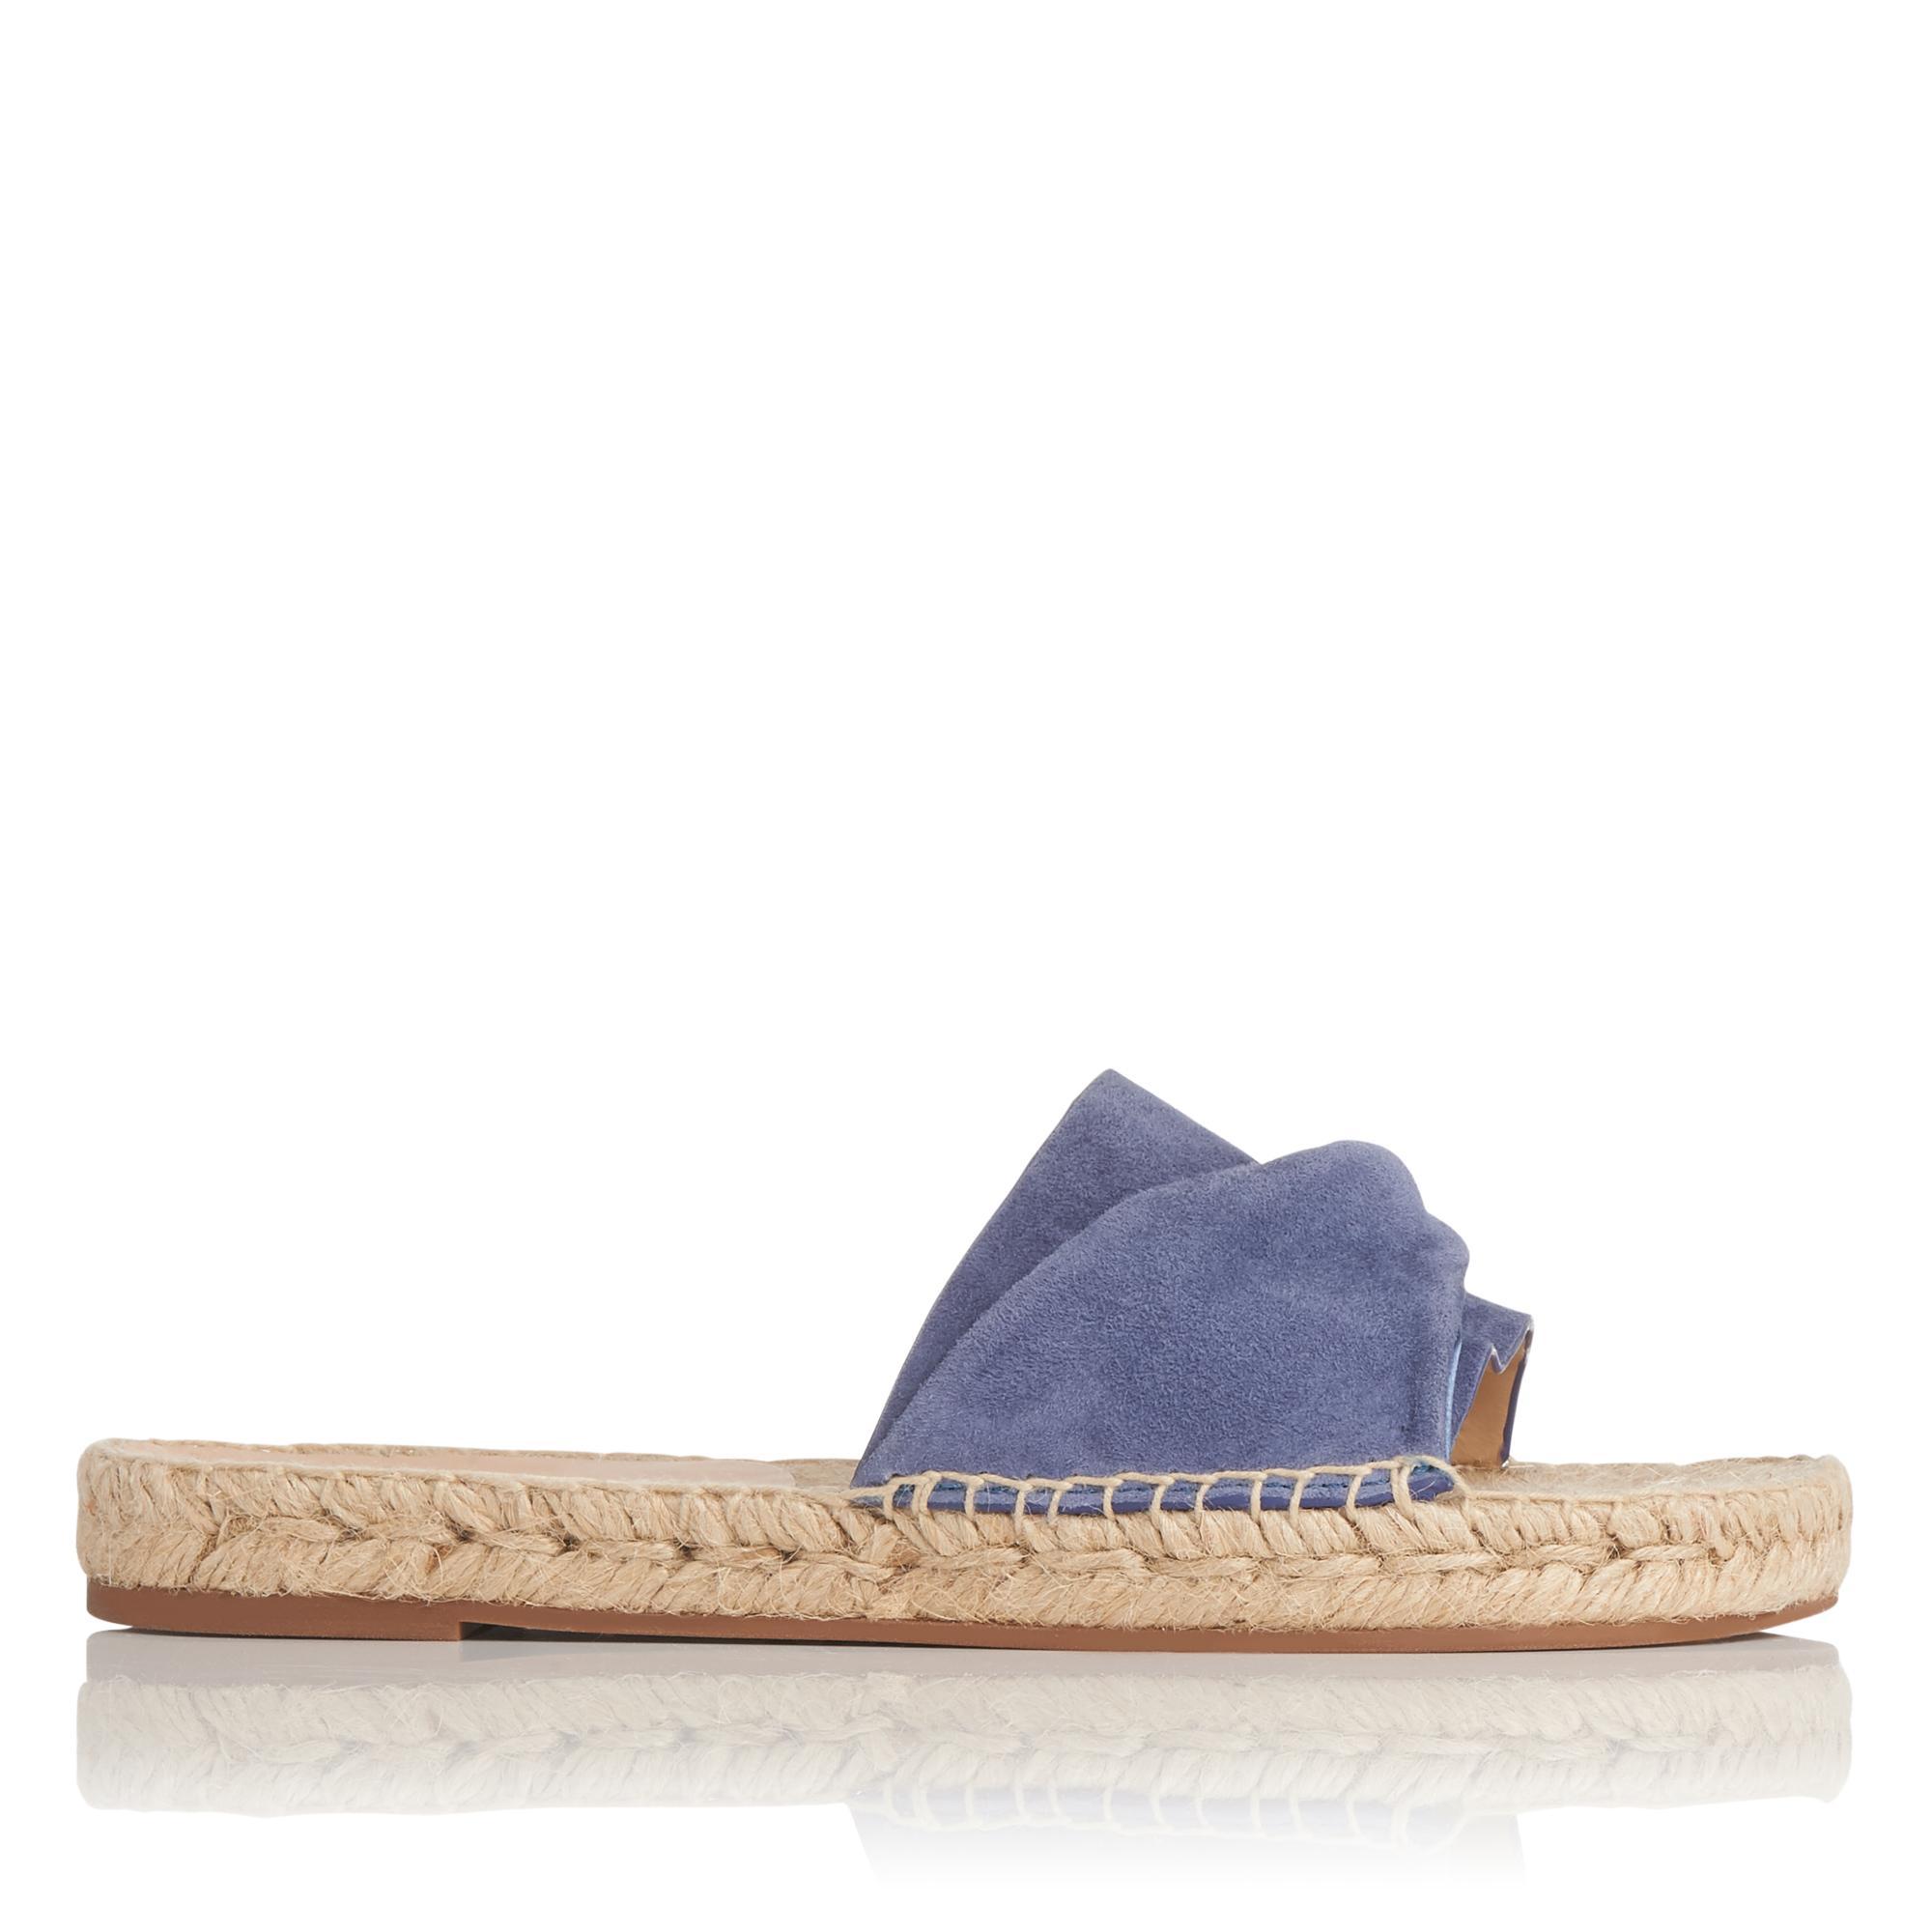 Alena Blue Suede Satin Flat Espadrille Sandals